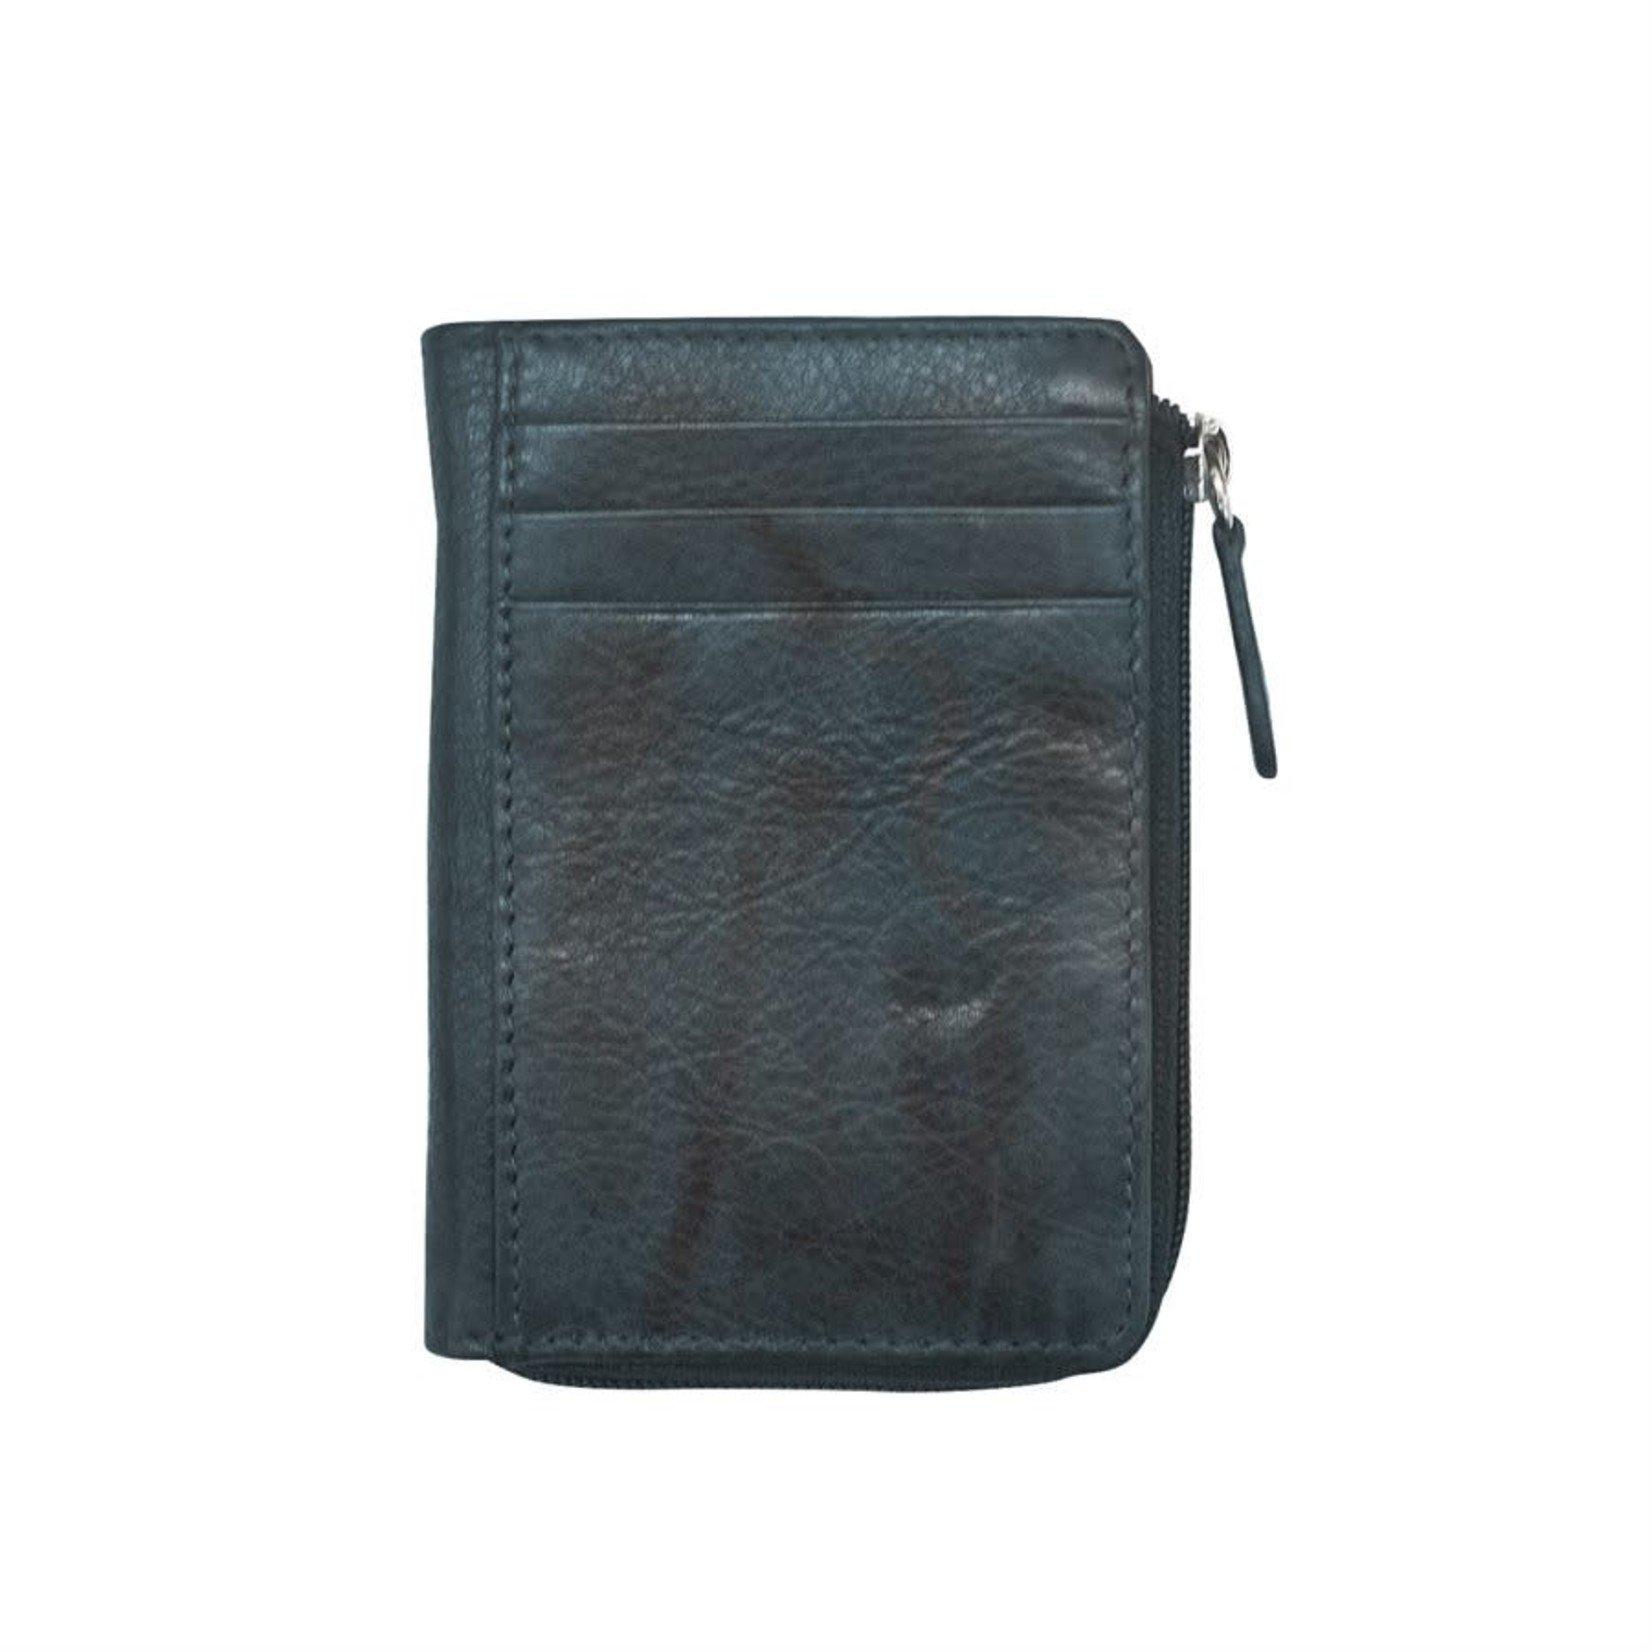 Leather Handbags and Accessories 7411 Indigo - RFID CC ID Holder